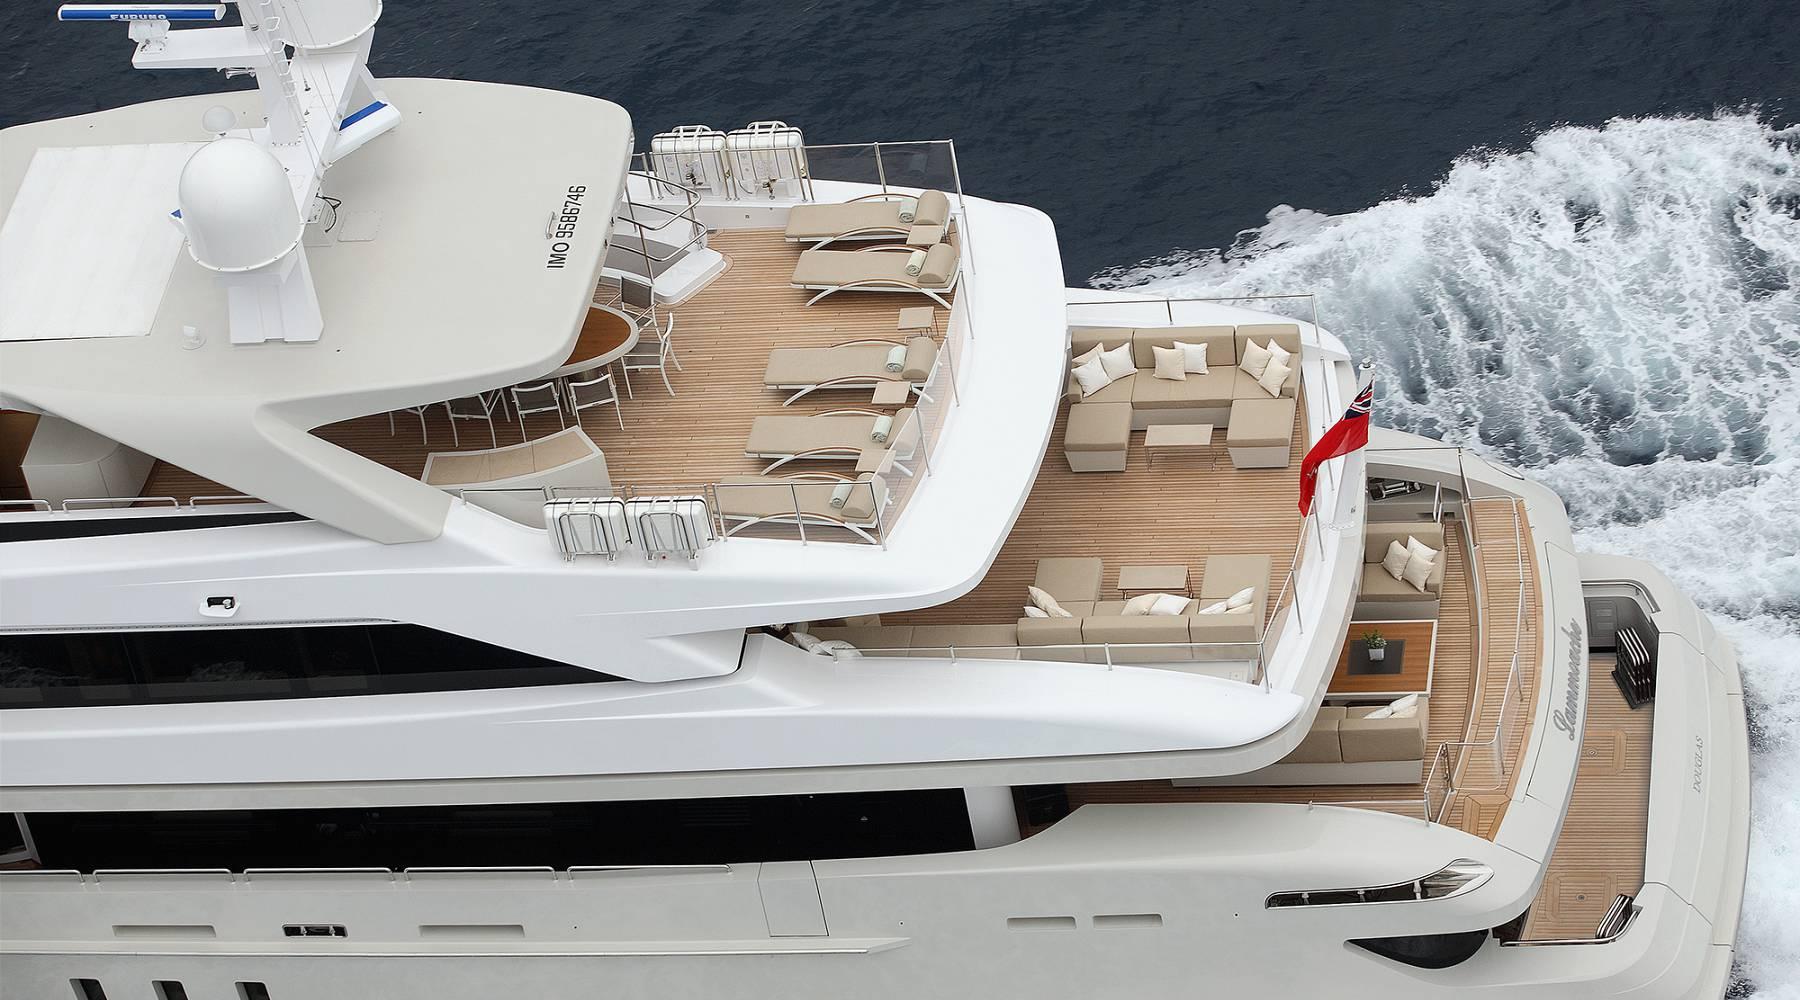 sanlorenzo yachts french riviera steel 46